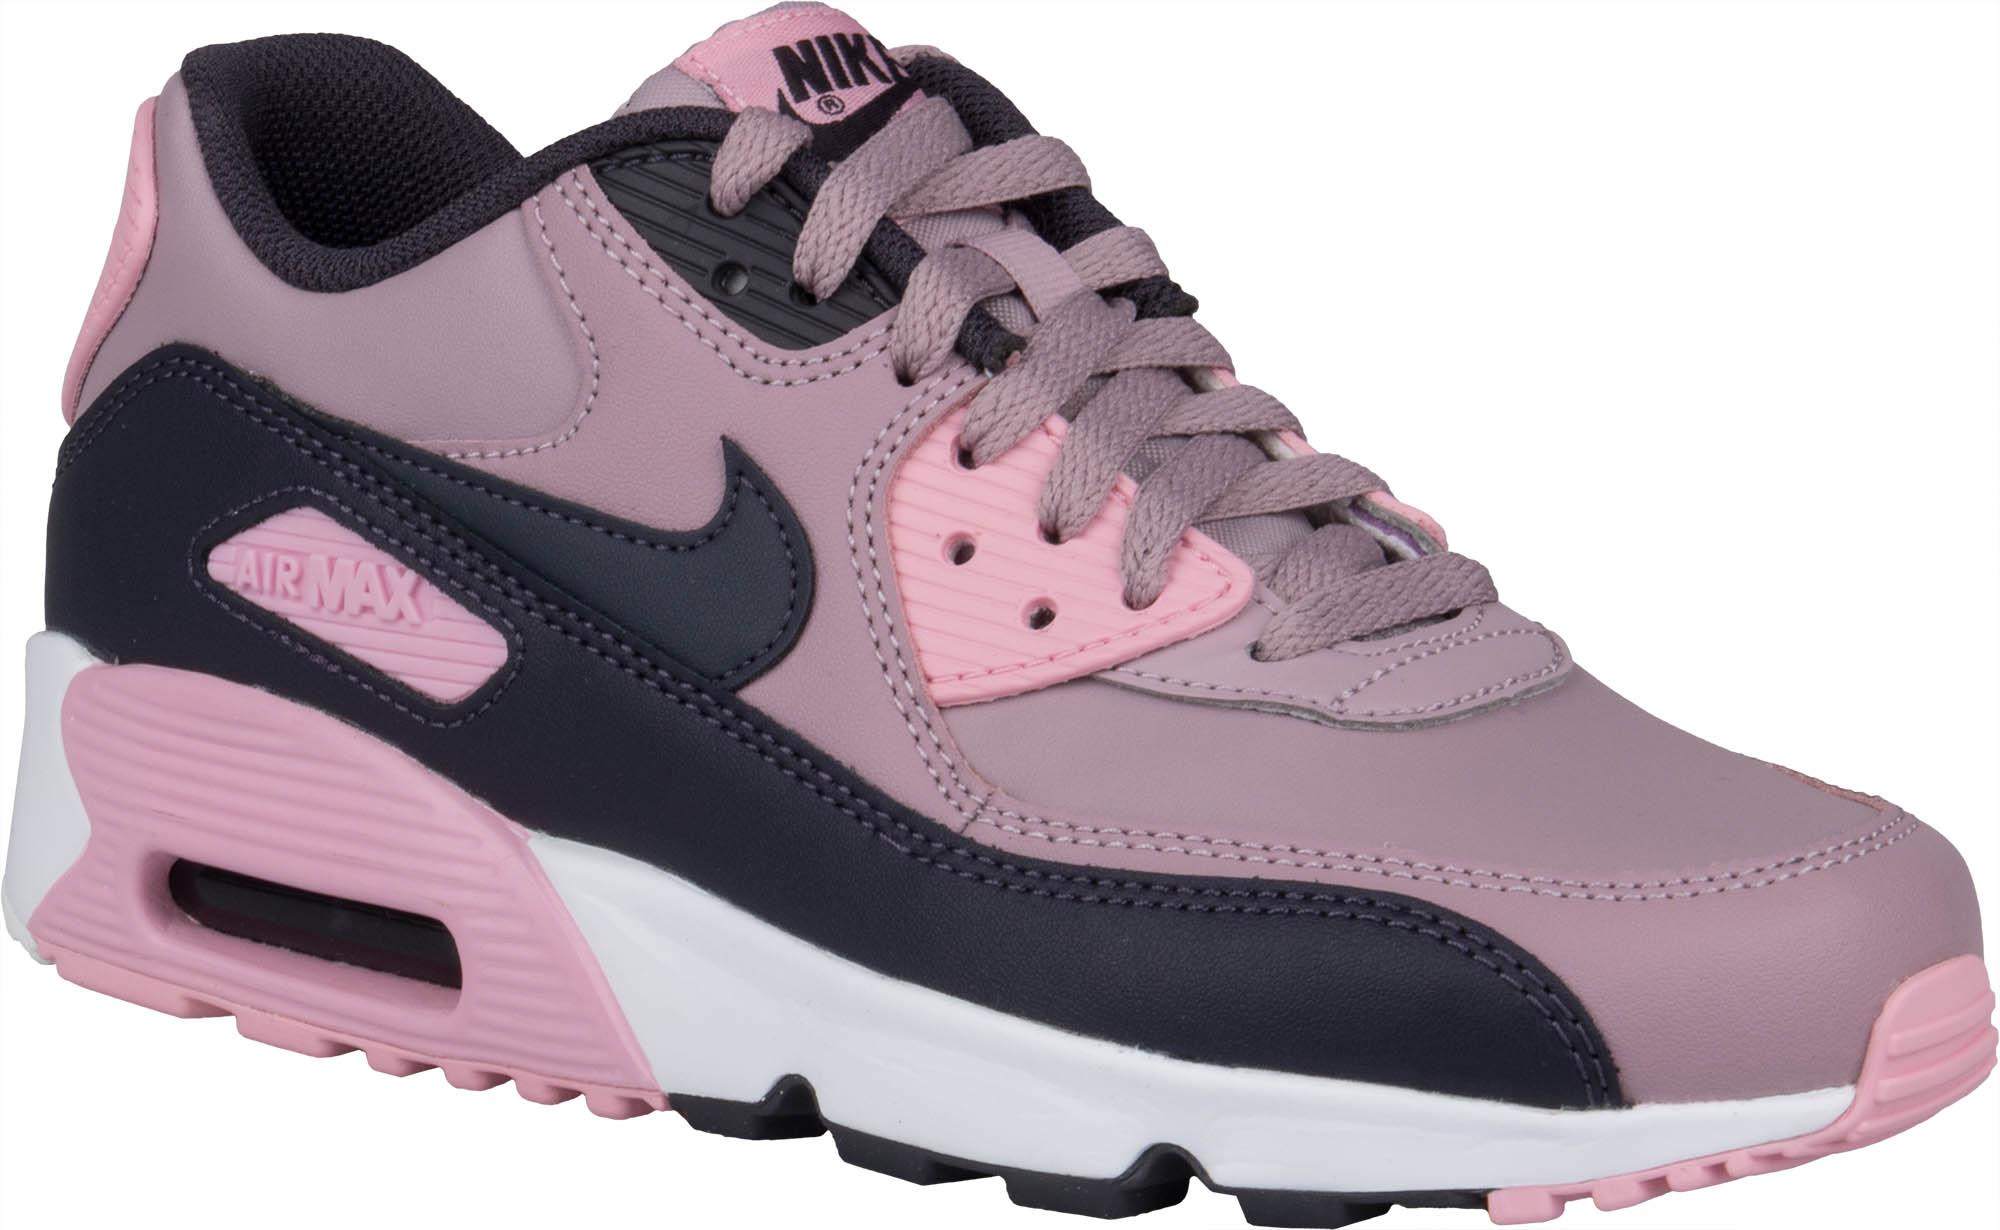 66478f6a7eb Nike AIR MAX 90 LEATHER - Glami.cz